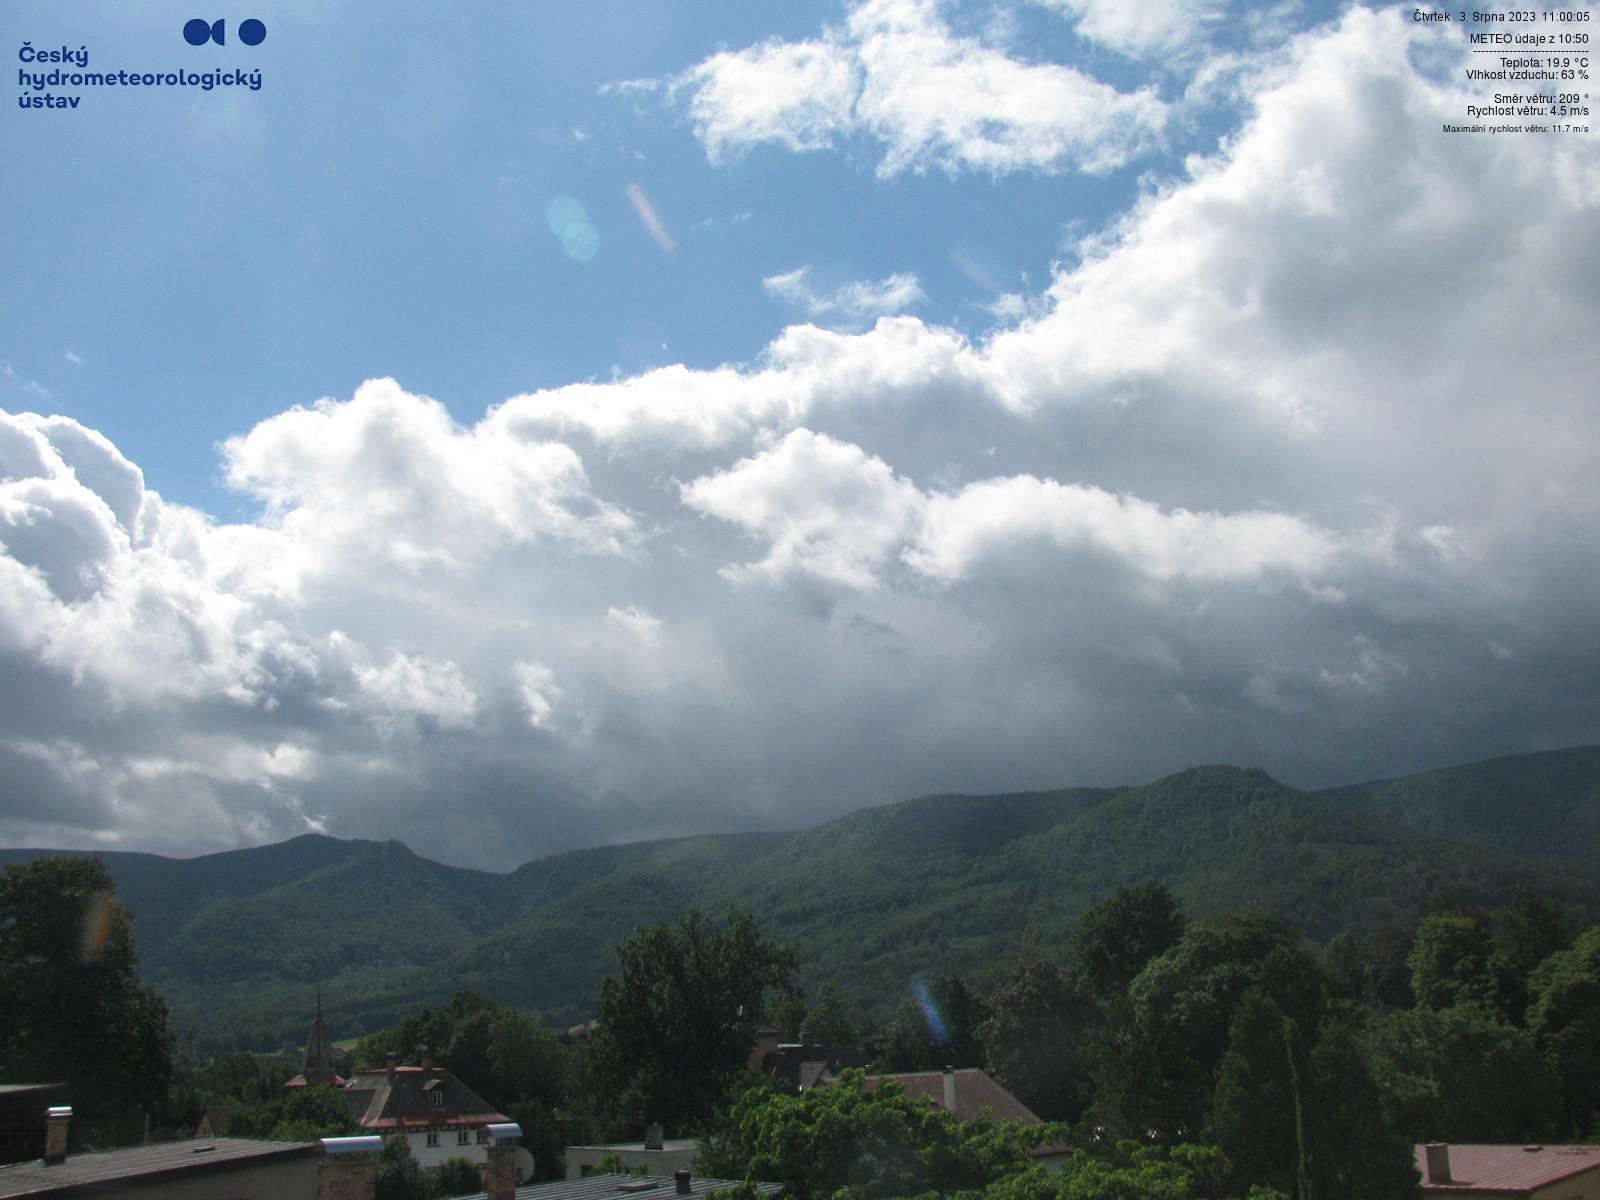 Webcam - Hejnice